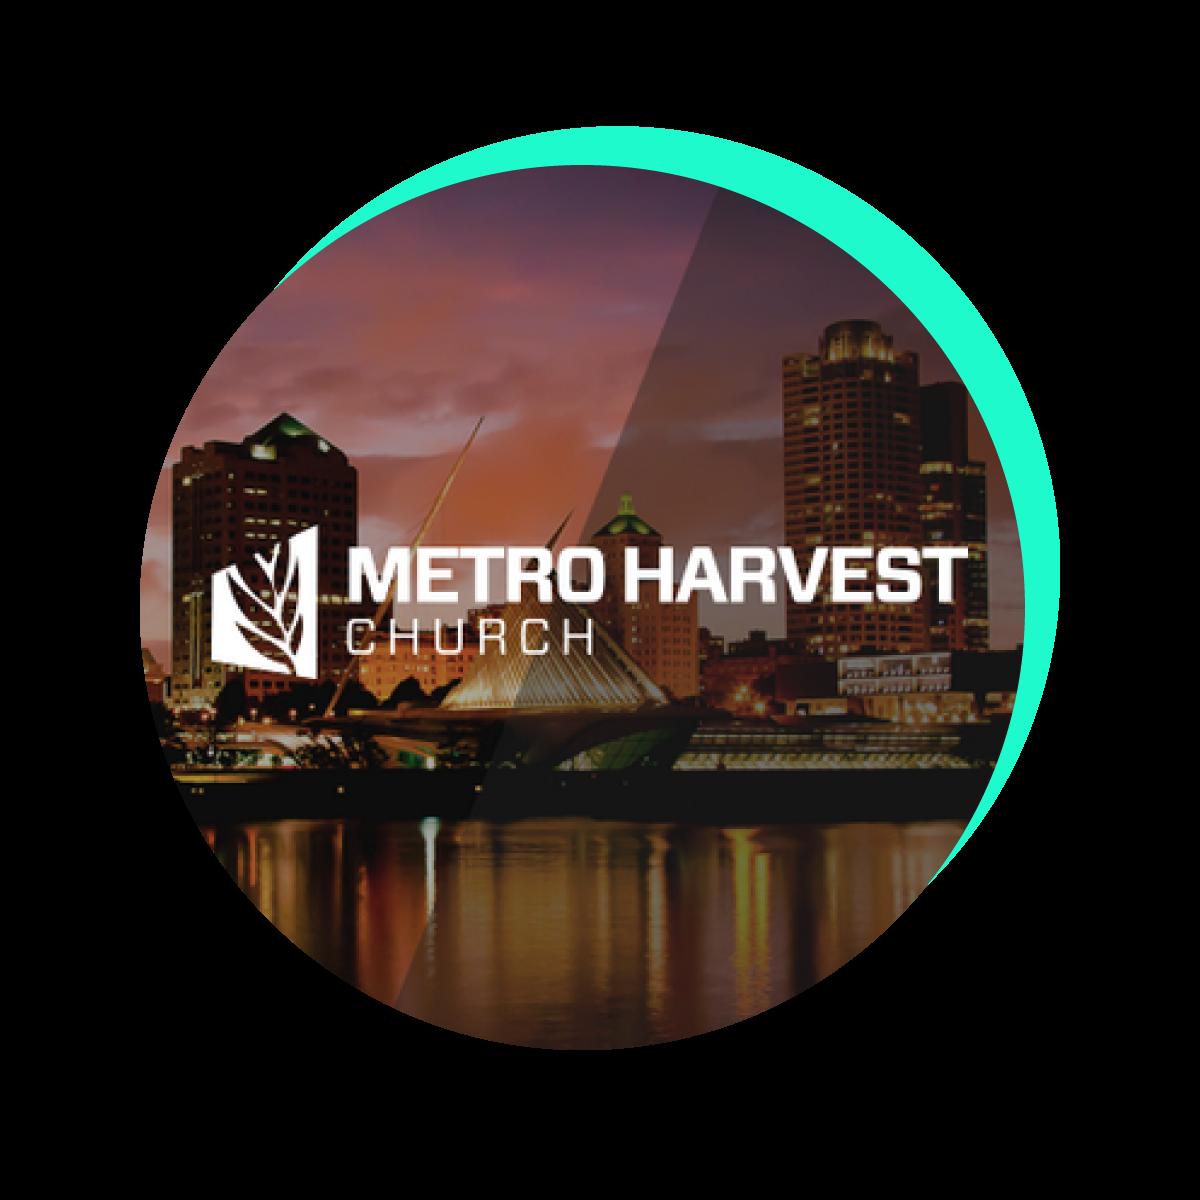 Metro Harvest Church